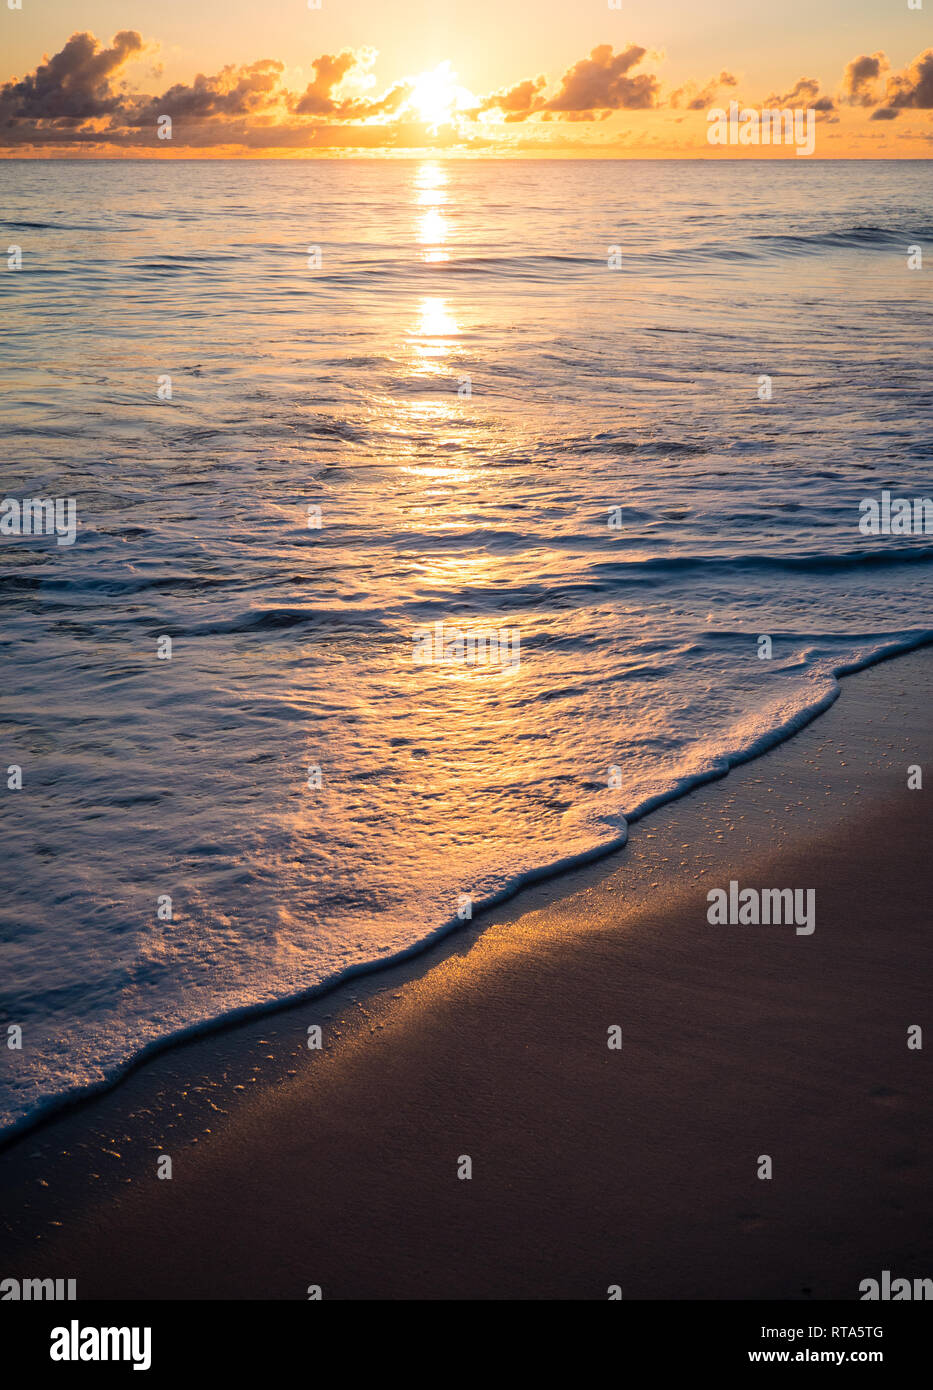 Waves Hitting Tropical Beach, Sunrise above sea, Island of